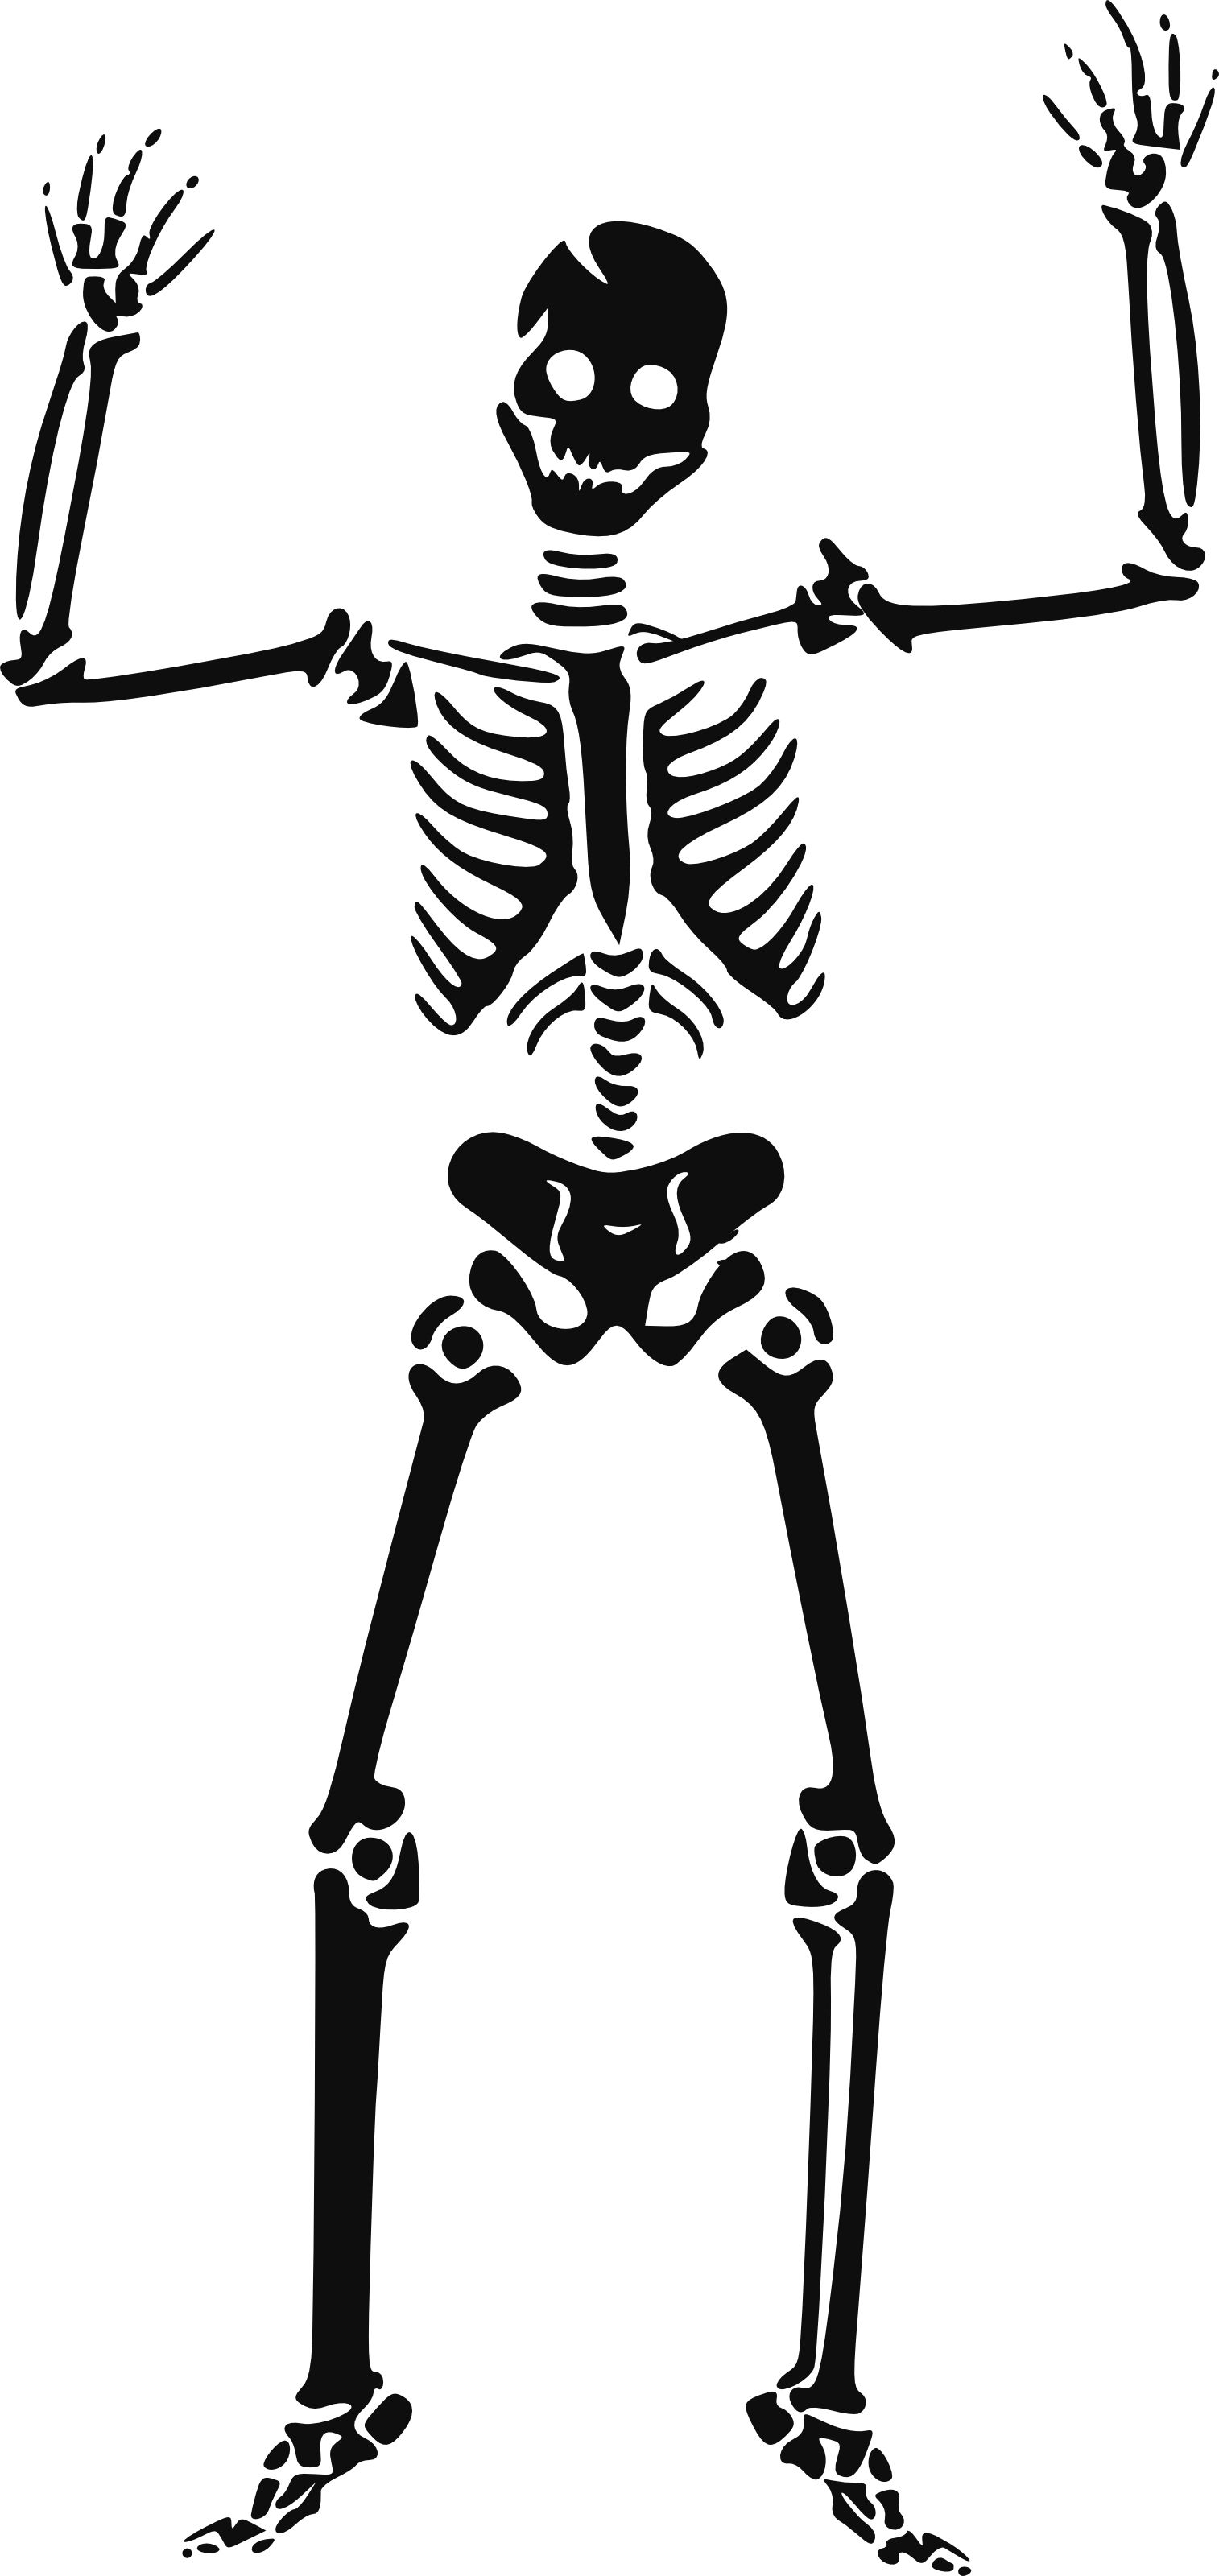 small resolution of 117 happy skeleton free halloween vector clipart illustration